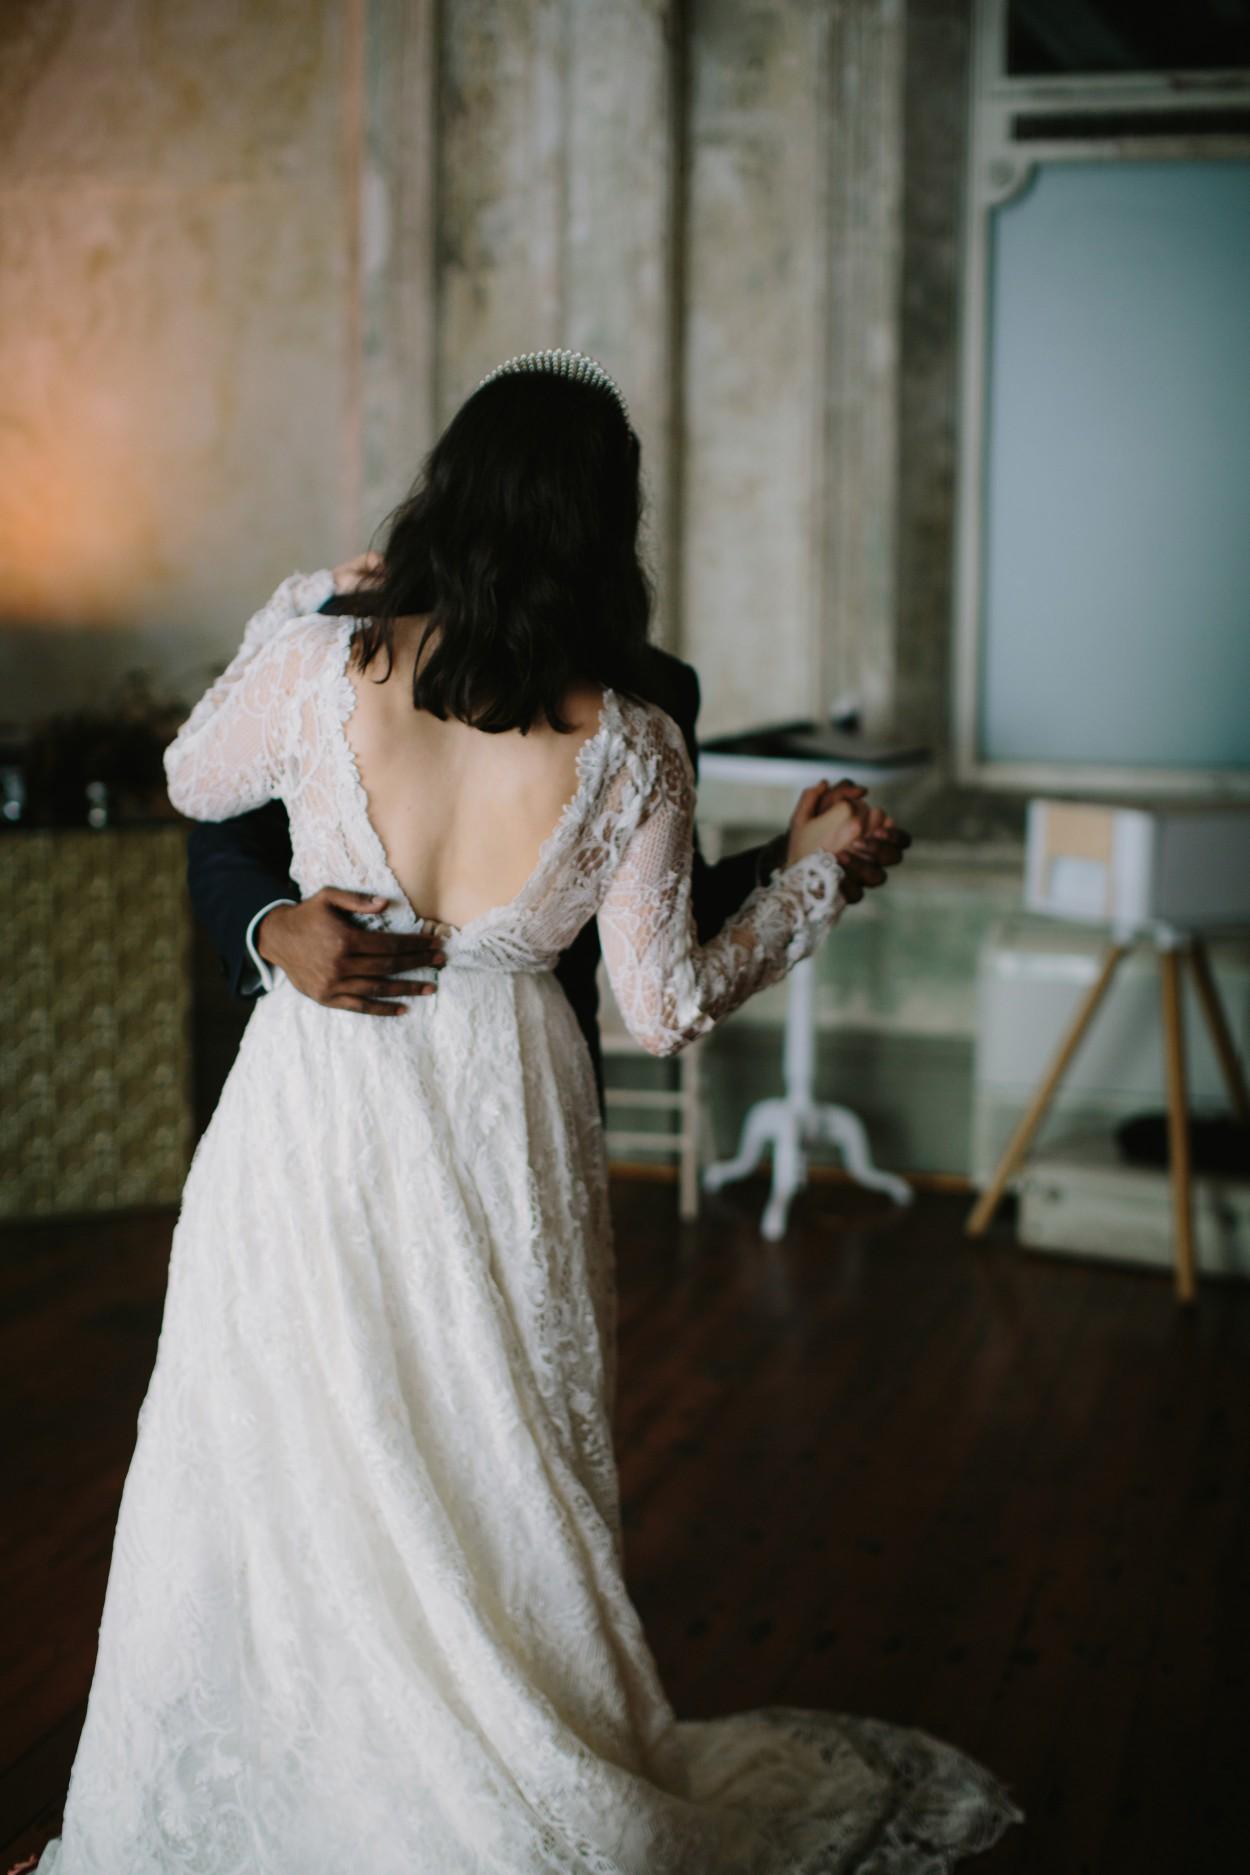 I-Got-You-Babe-Weddings-The-130George-Ballroom-St-Kilda-Wedding-Amy-Abhi.jpg